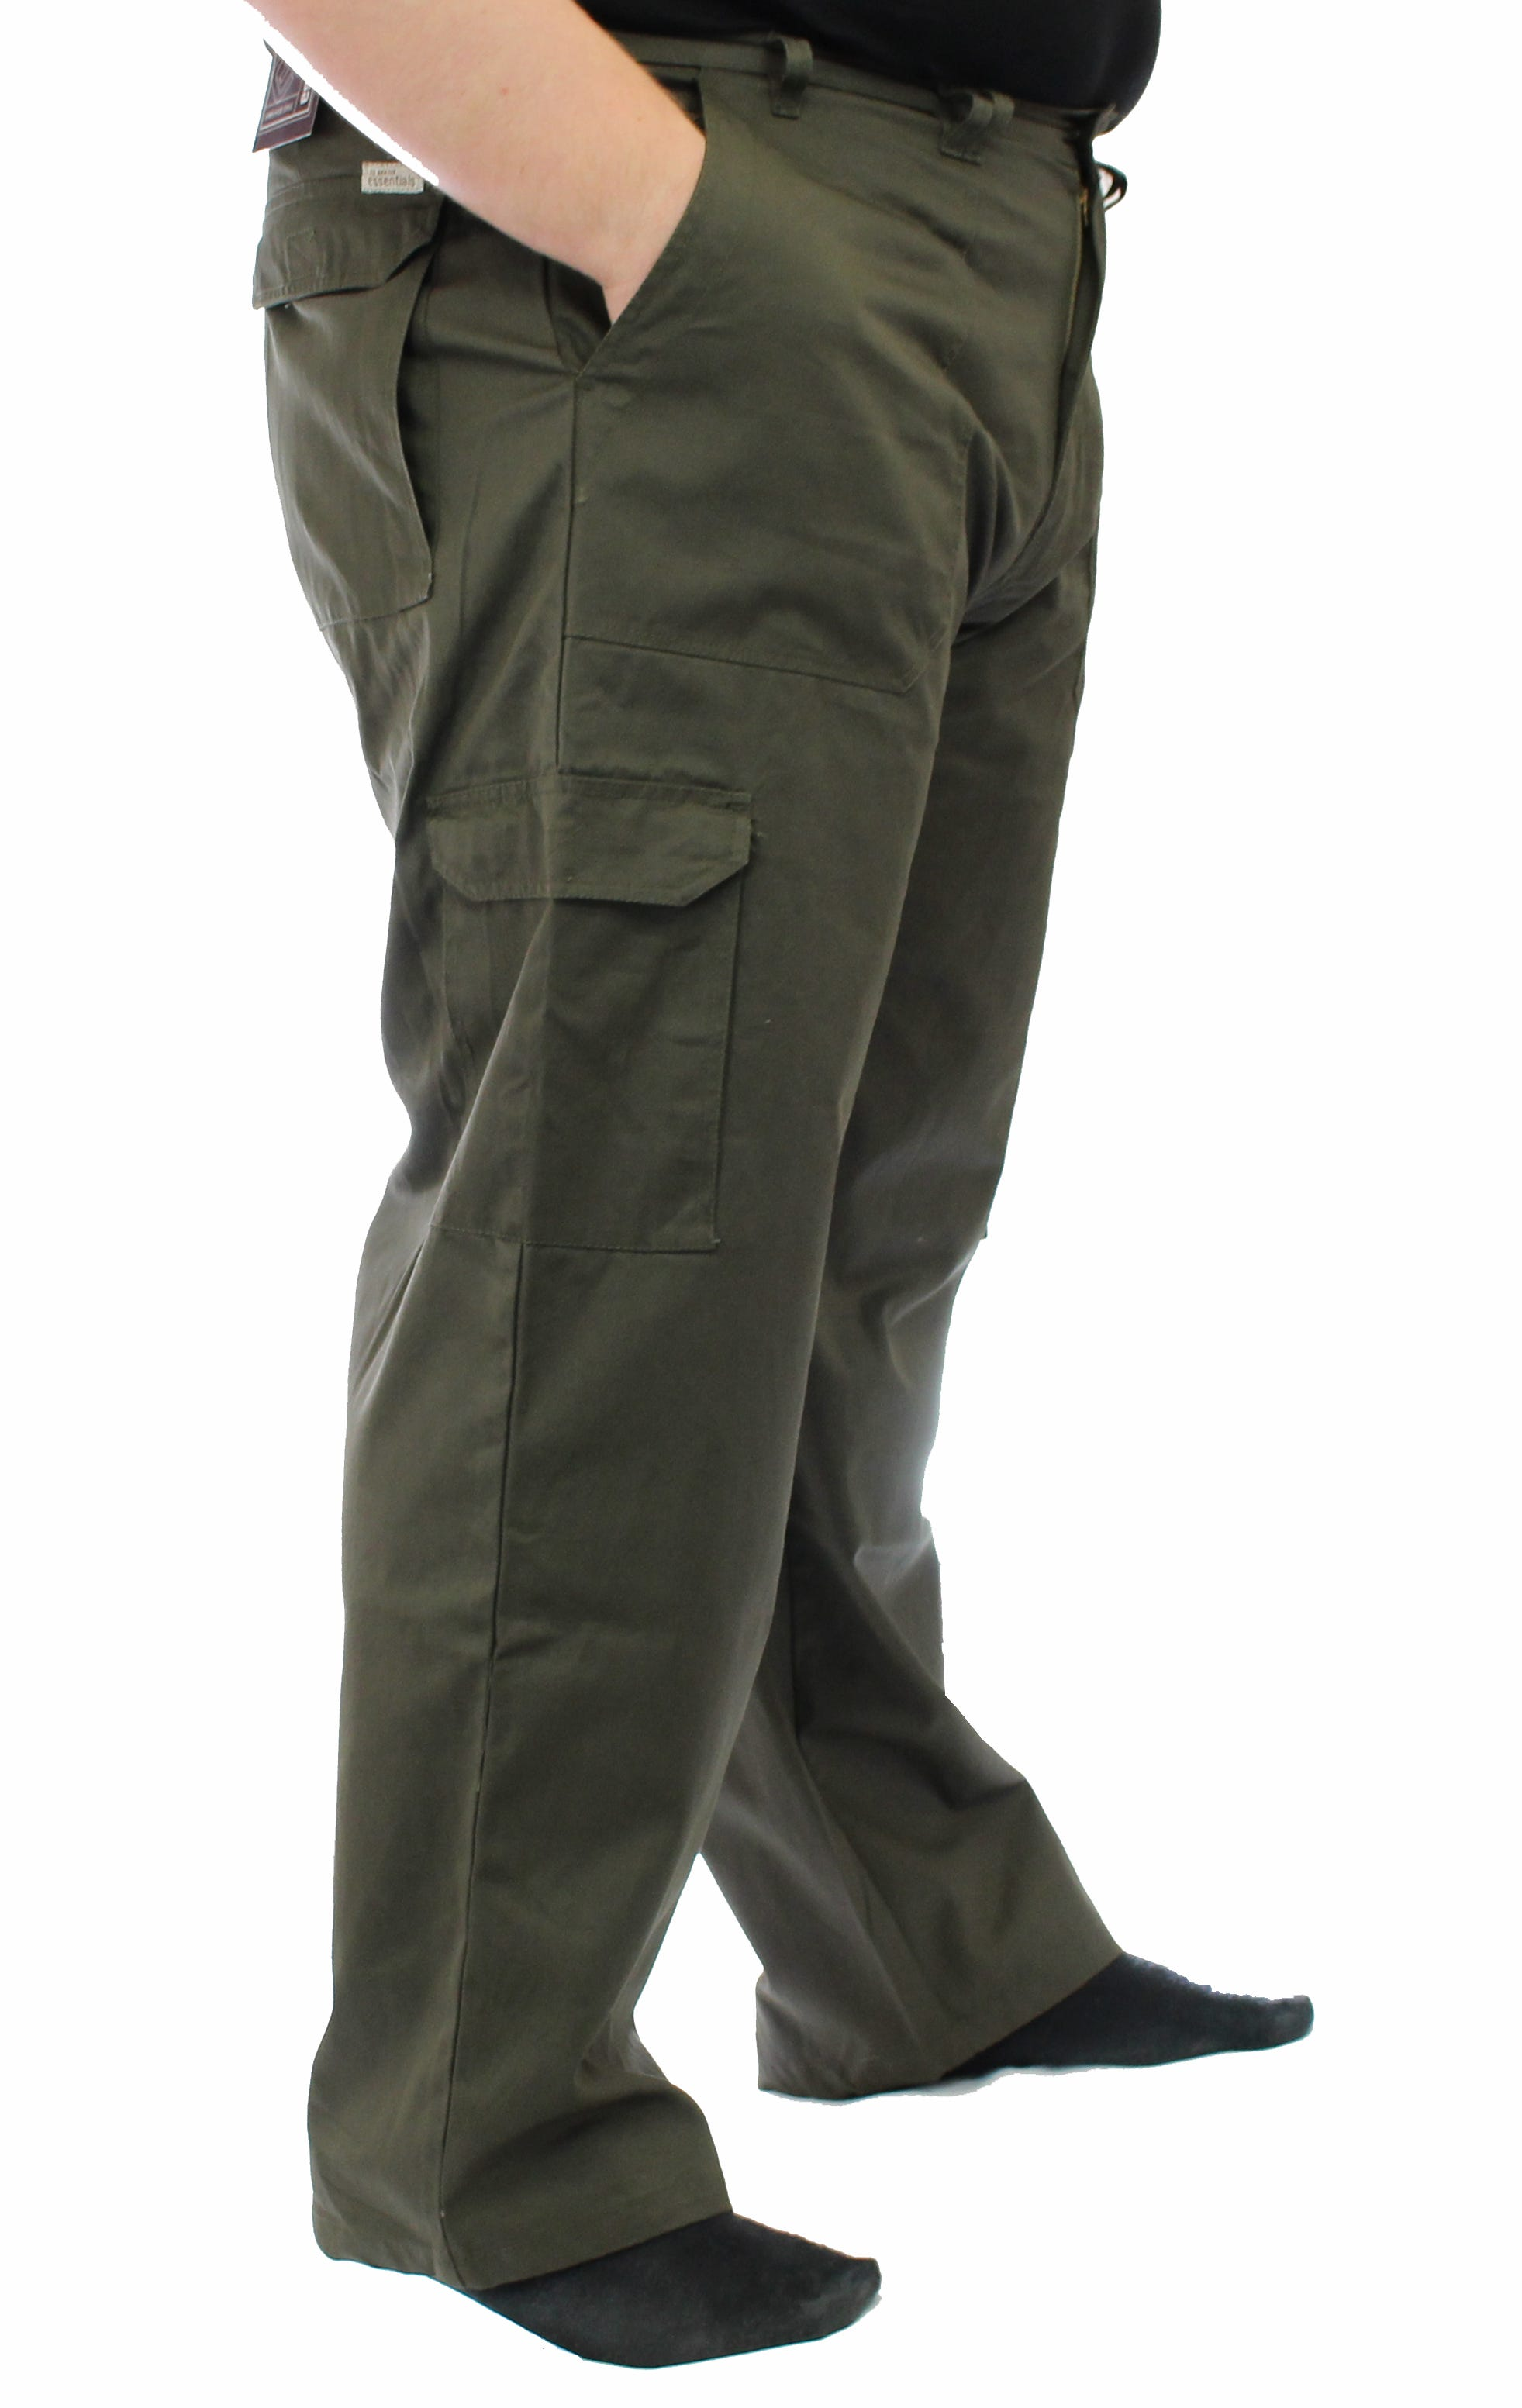 "Ed Baxter Victory - Heavy Duty Cargo Combat Trousers - Khaki - 62"" Waist, 32"" Leg"